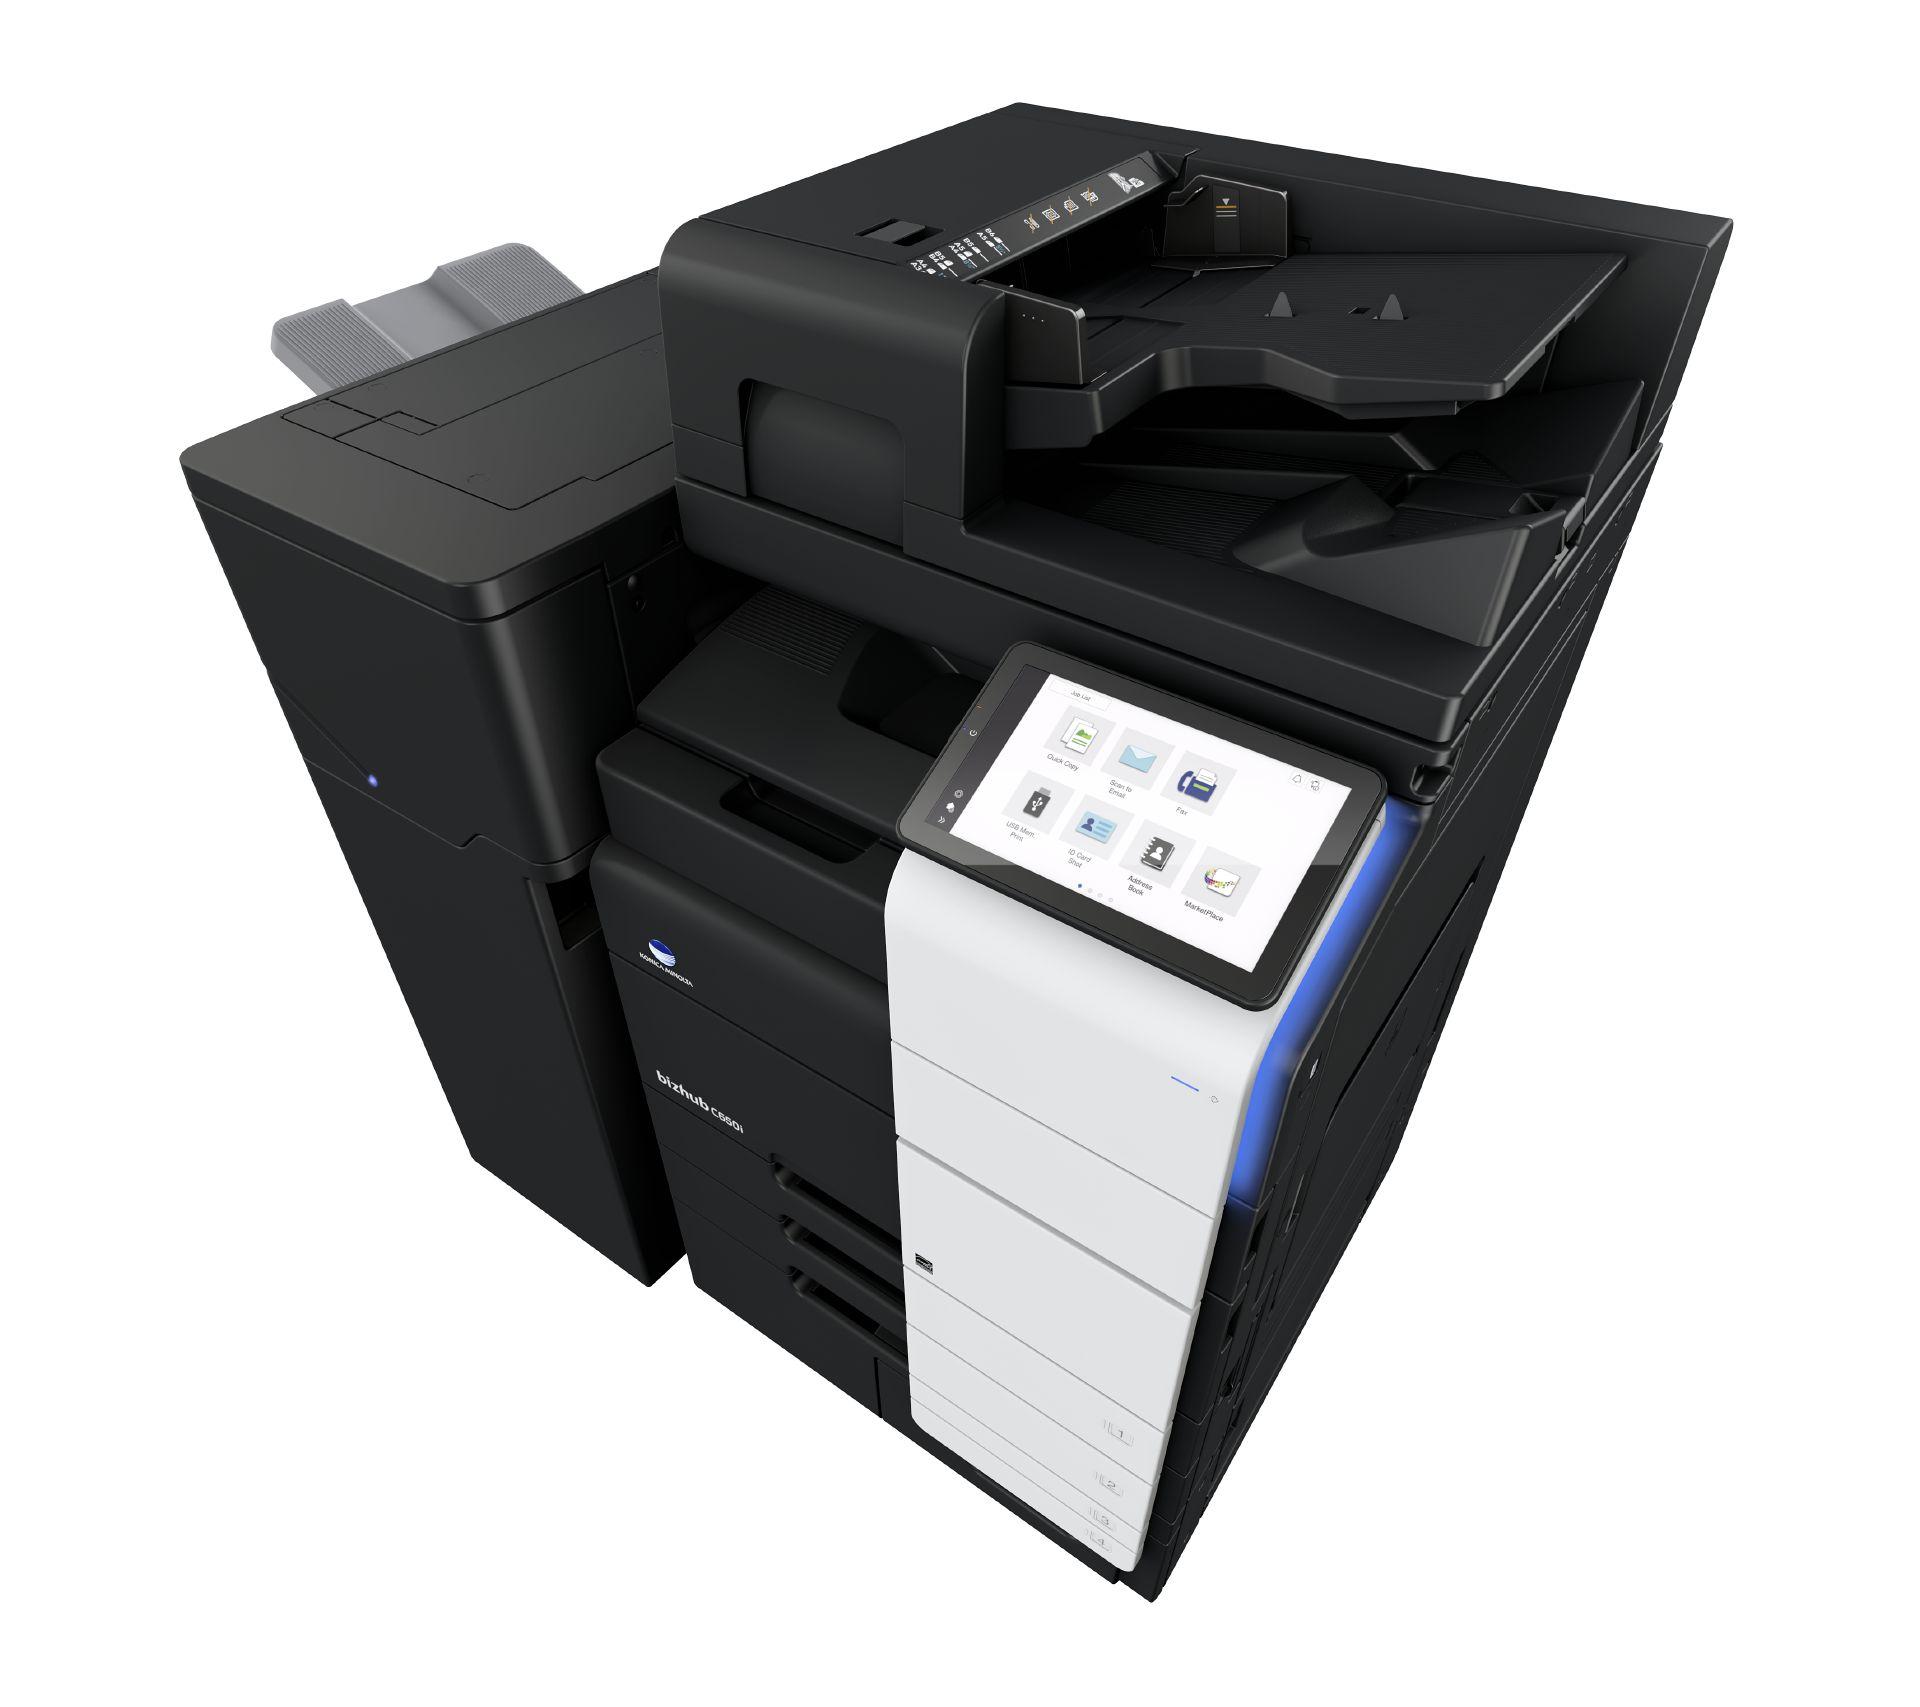 bizhub-C650i-mdtech-kserokopiarka